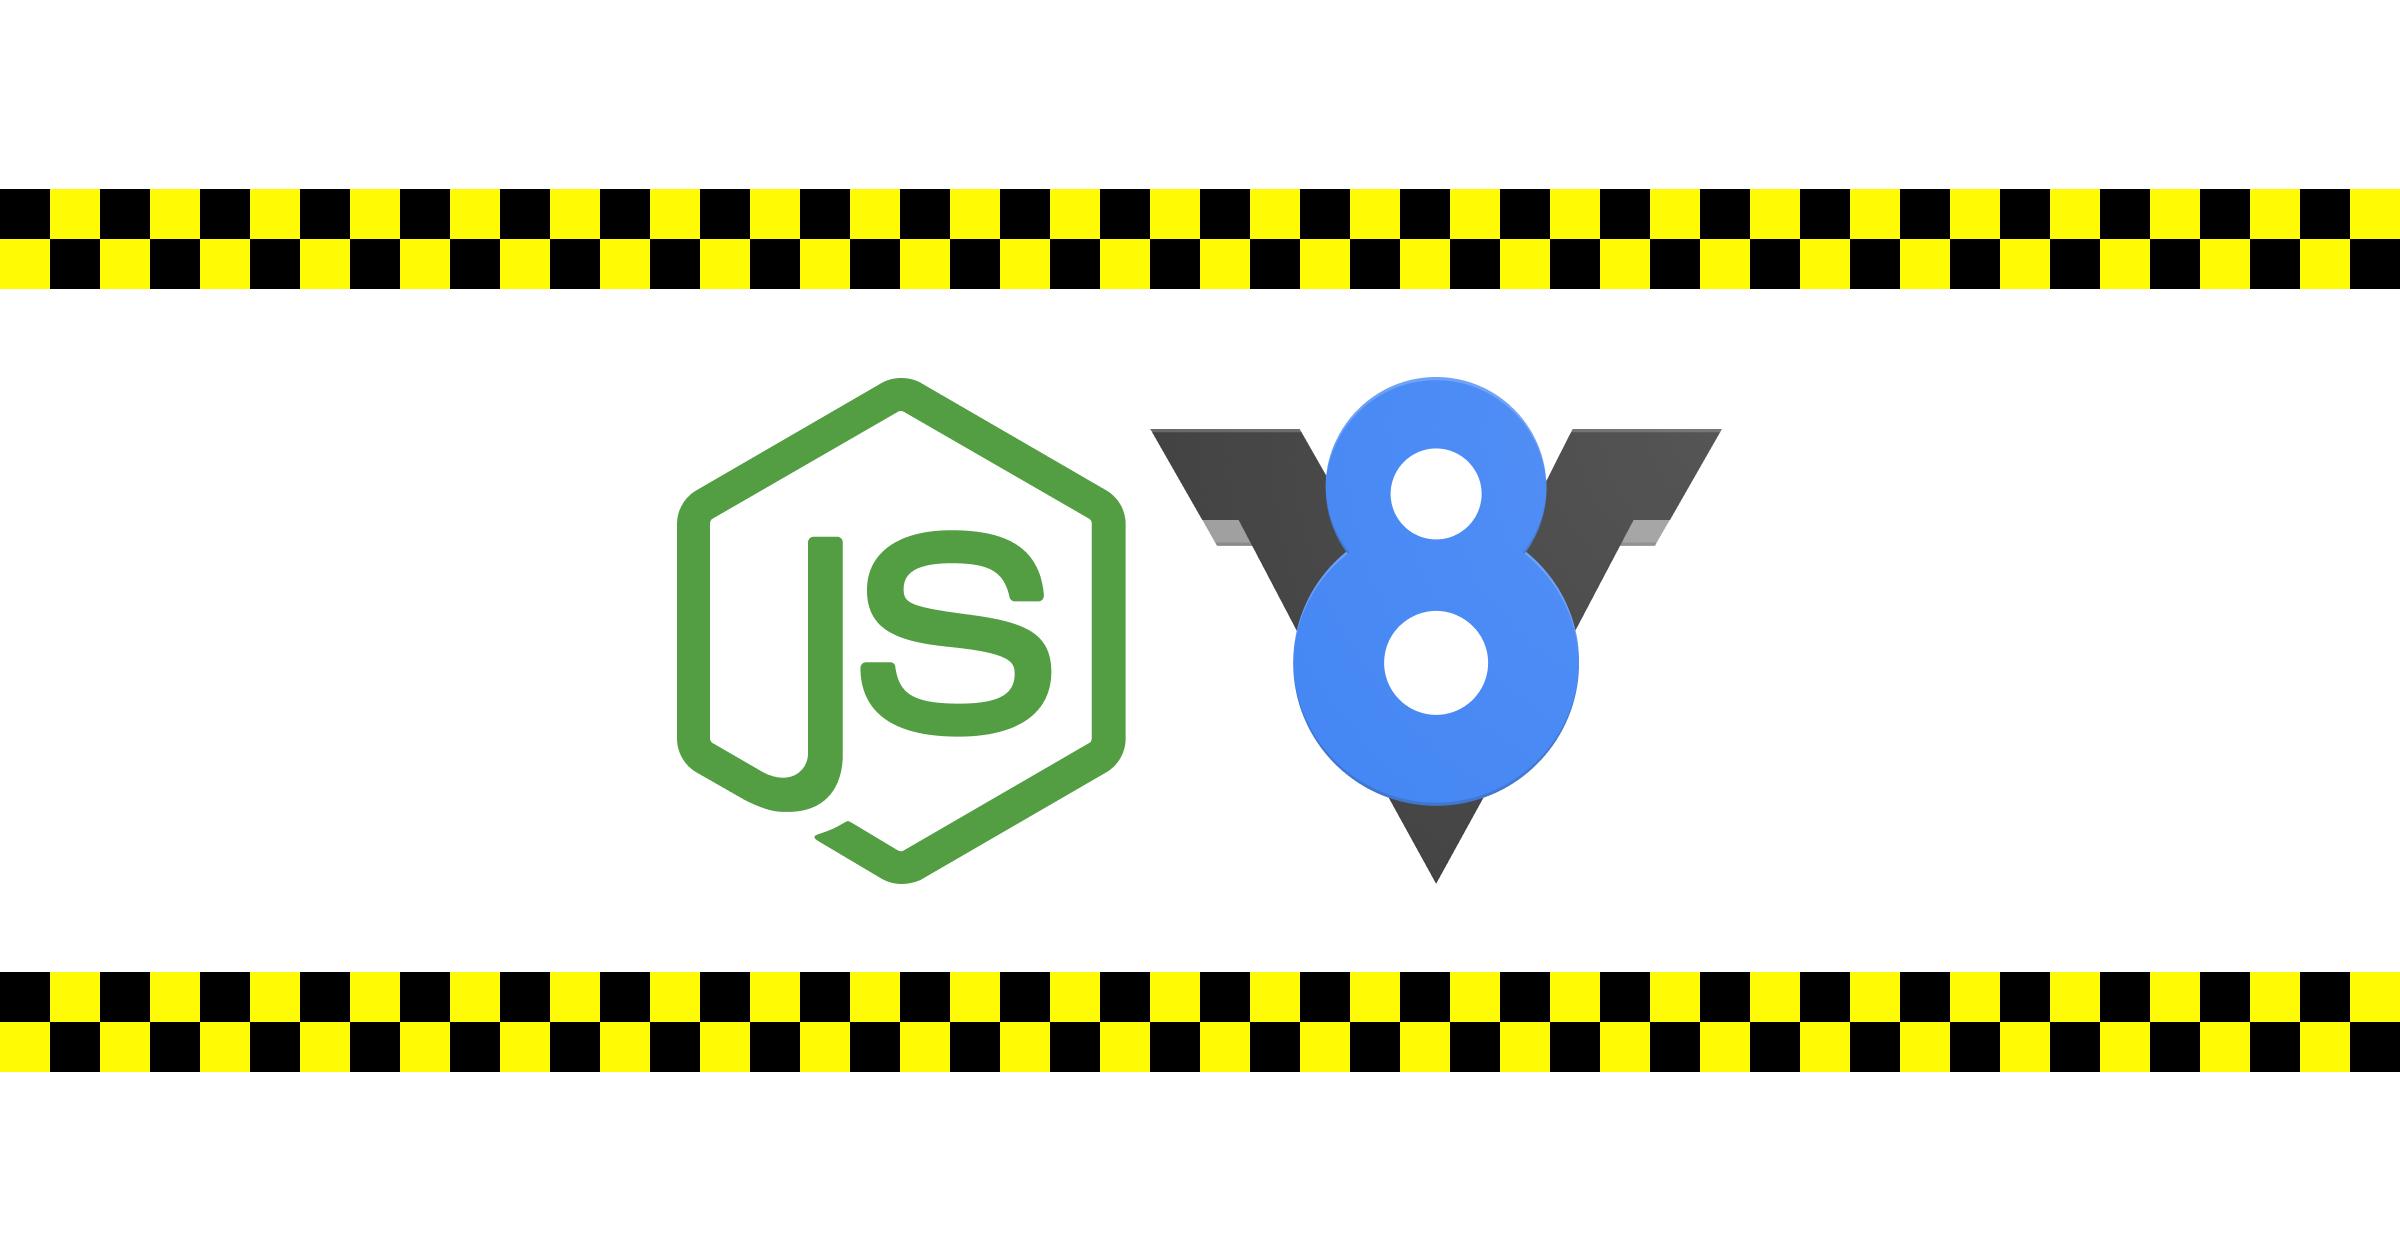 jaydenseric/coverage-node GitHub repo thumbnail.